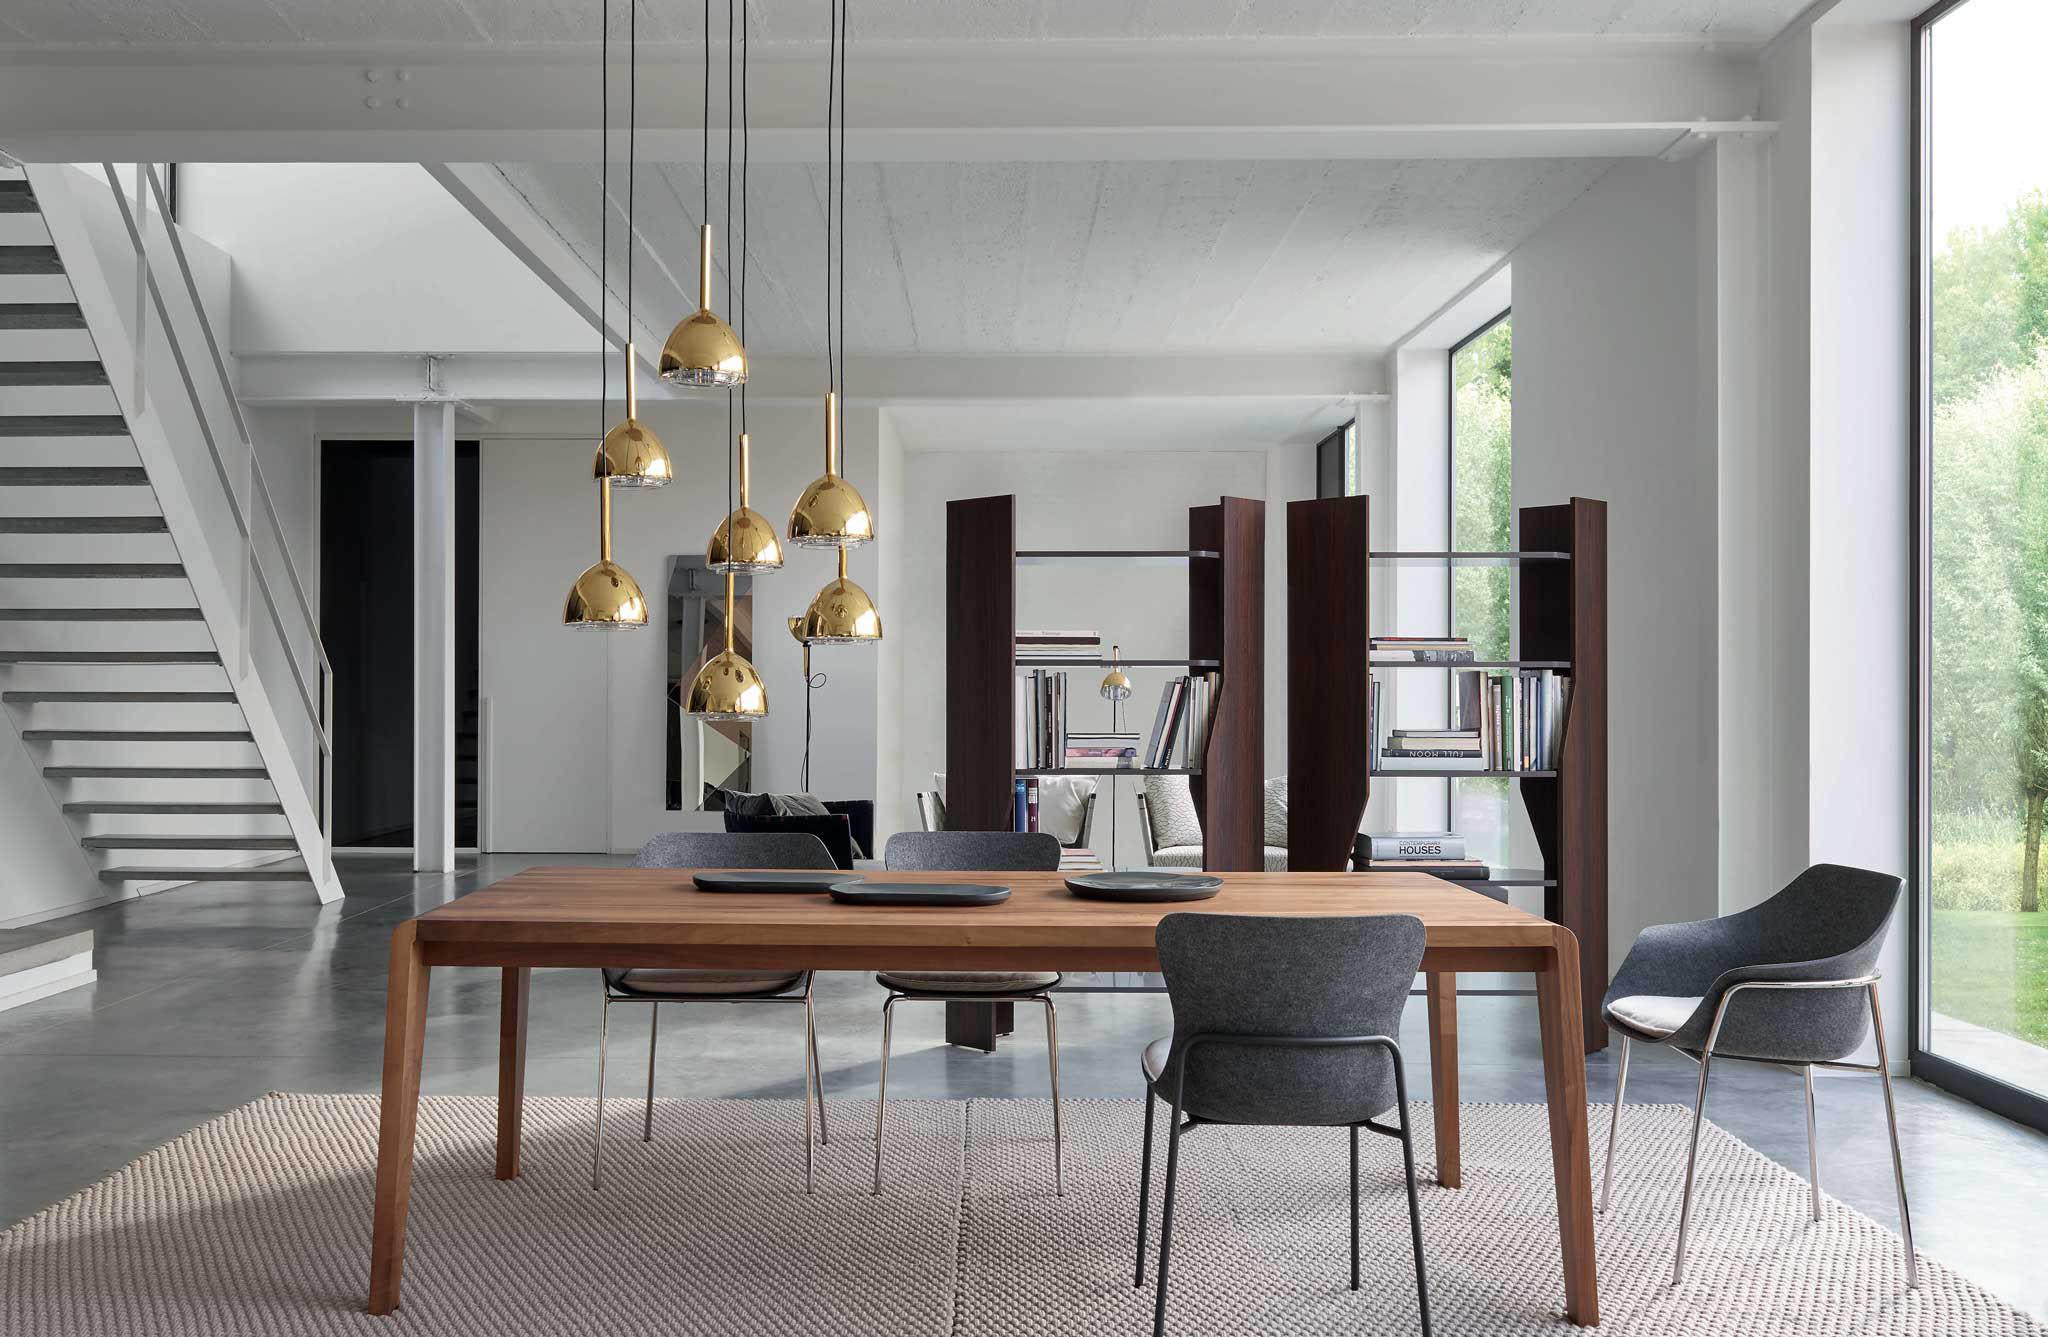 Sideris interiors branded furniture and interior design for Interior design cyprus